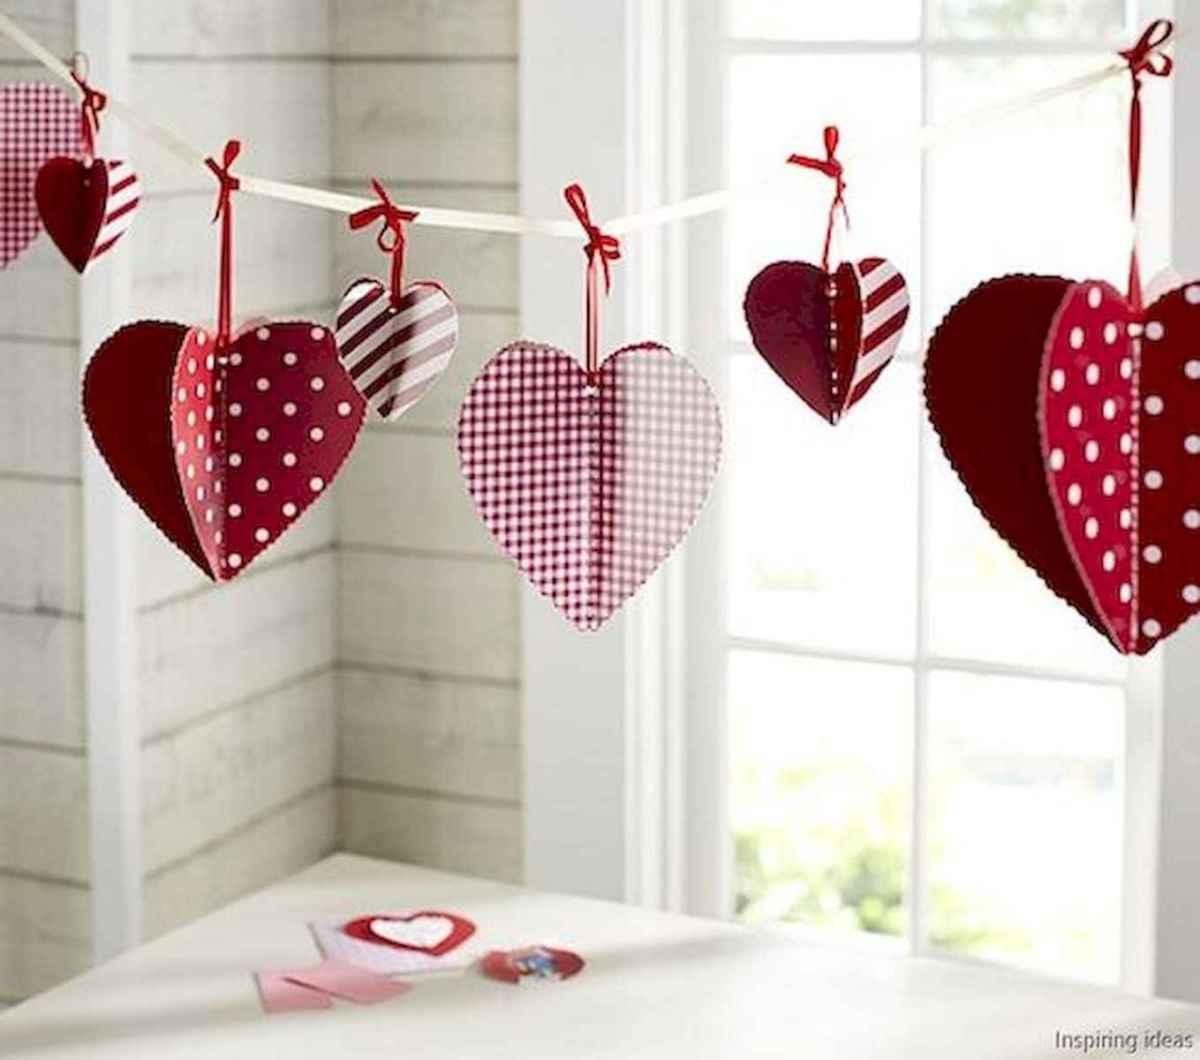 75 lovely valentines day crafts design ideas (9)